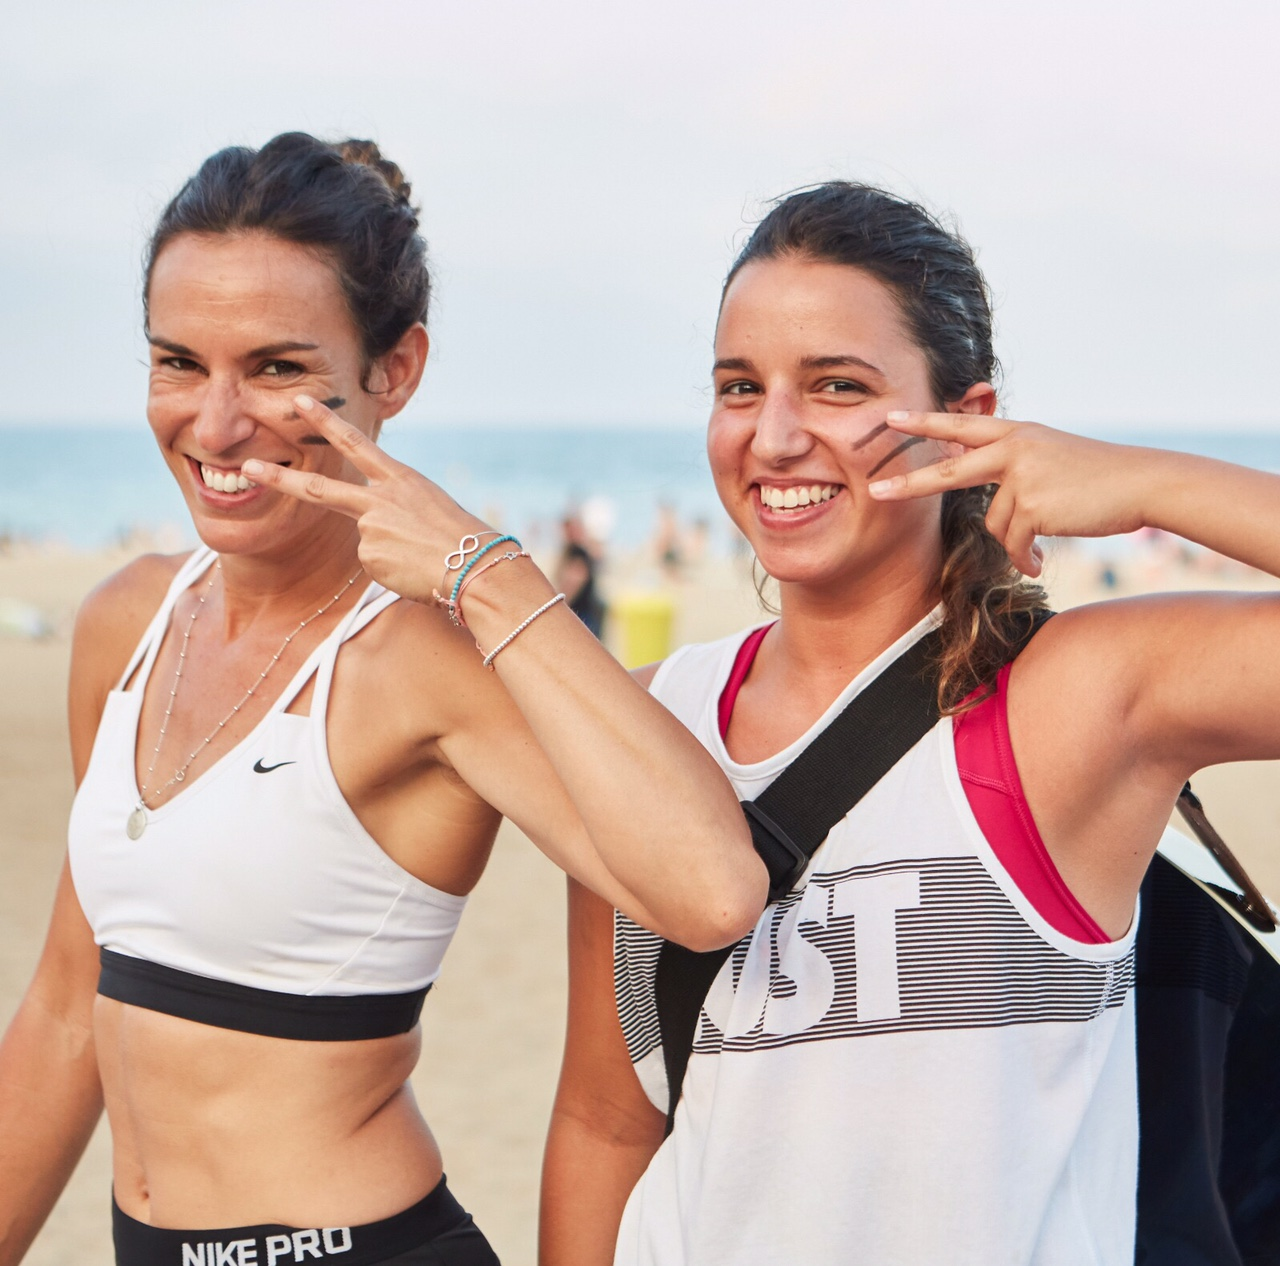 paula butragueño yoga barcelona playa acoustic fit anna pacheco